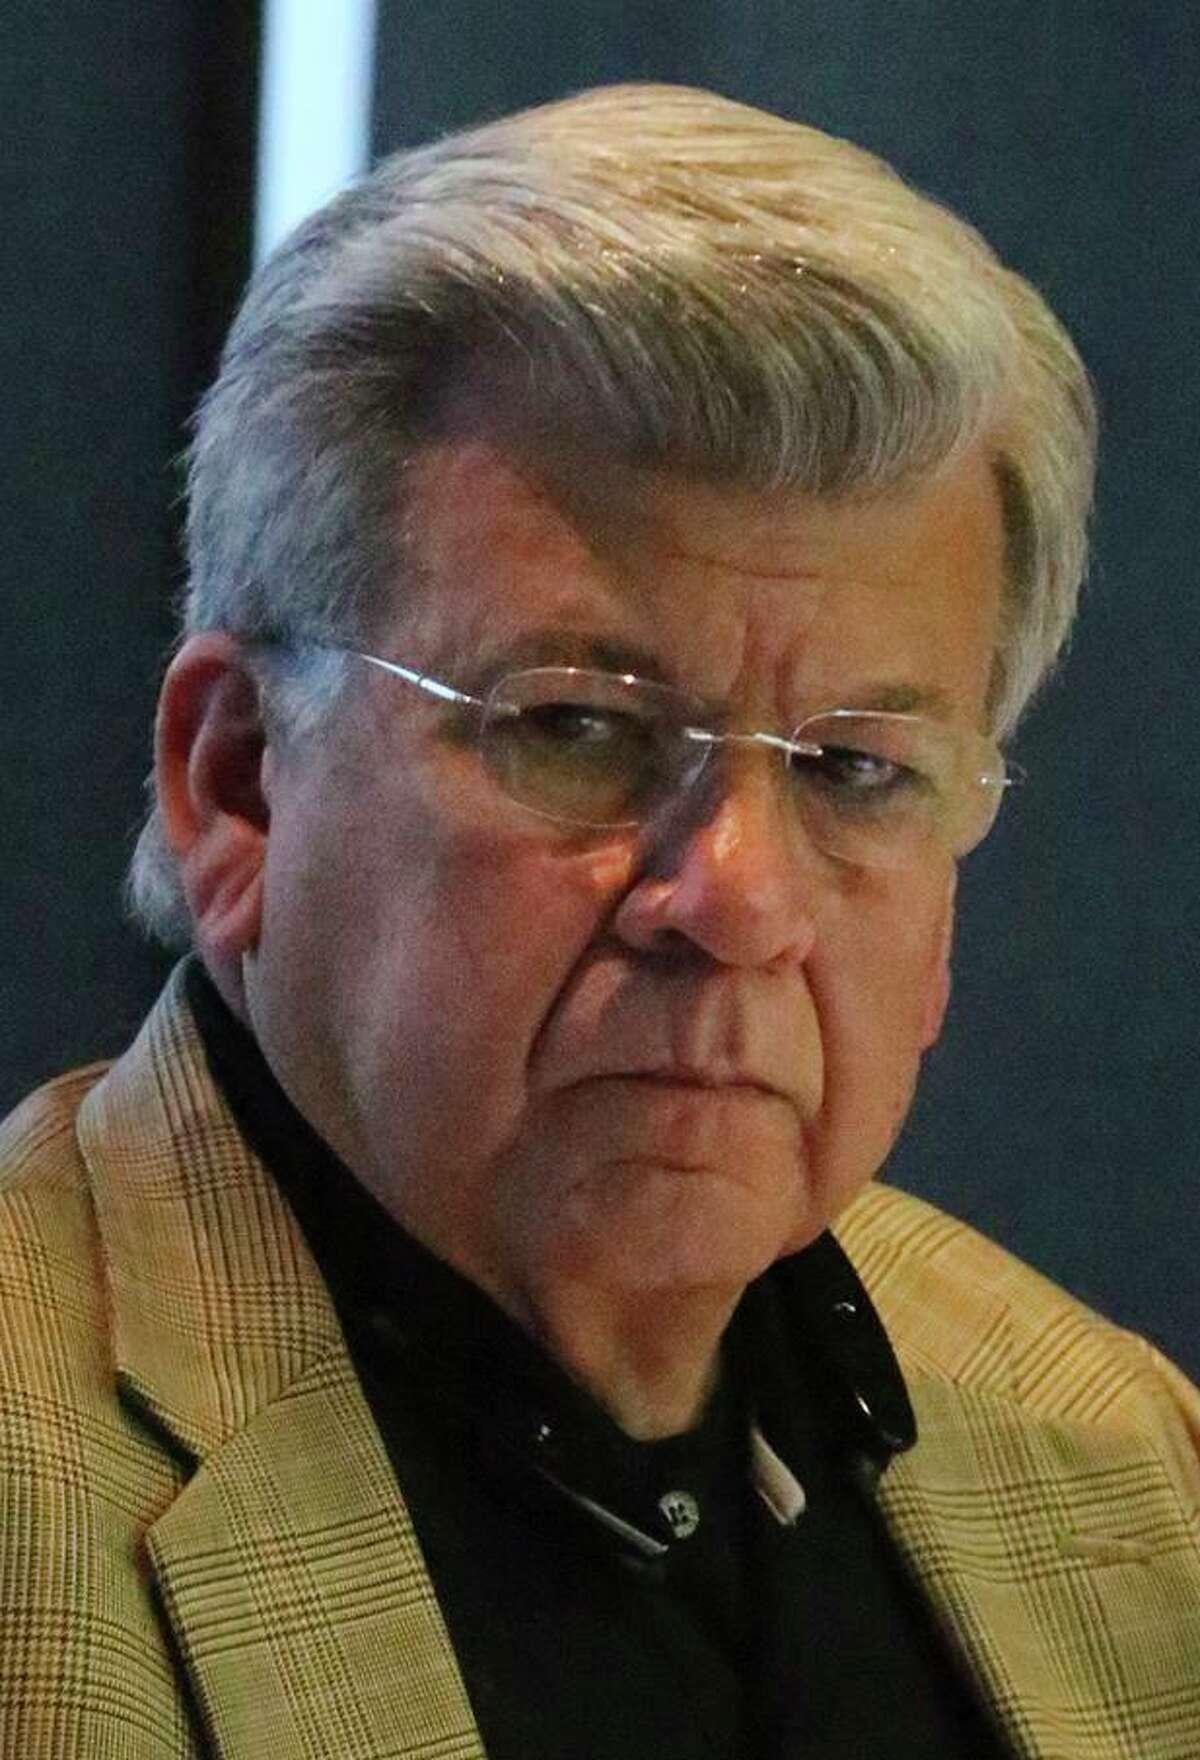 Berto Guerra, chairman of SAWS.